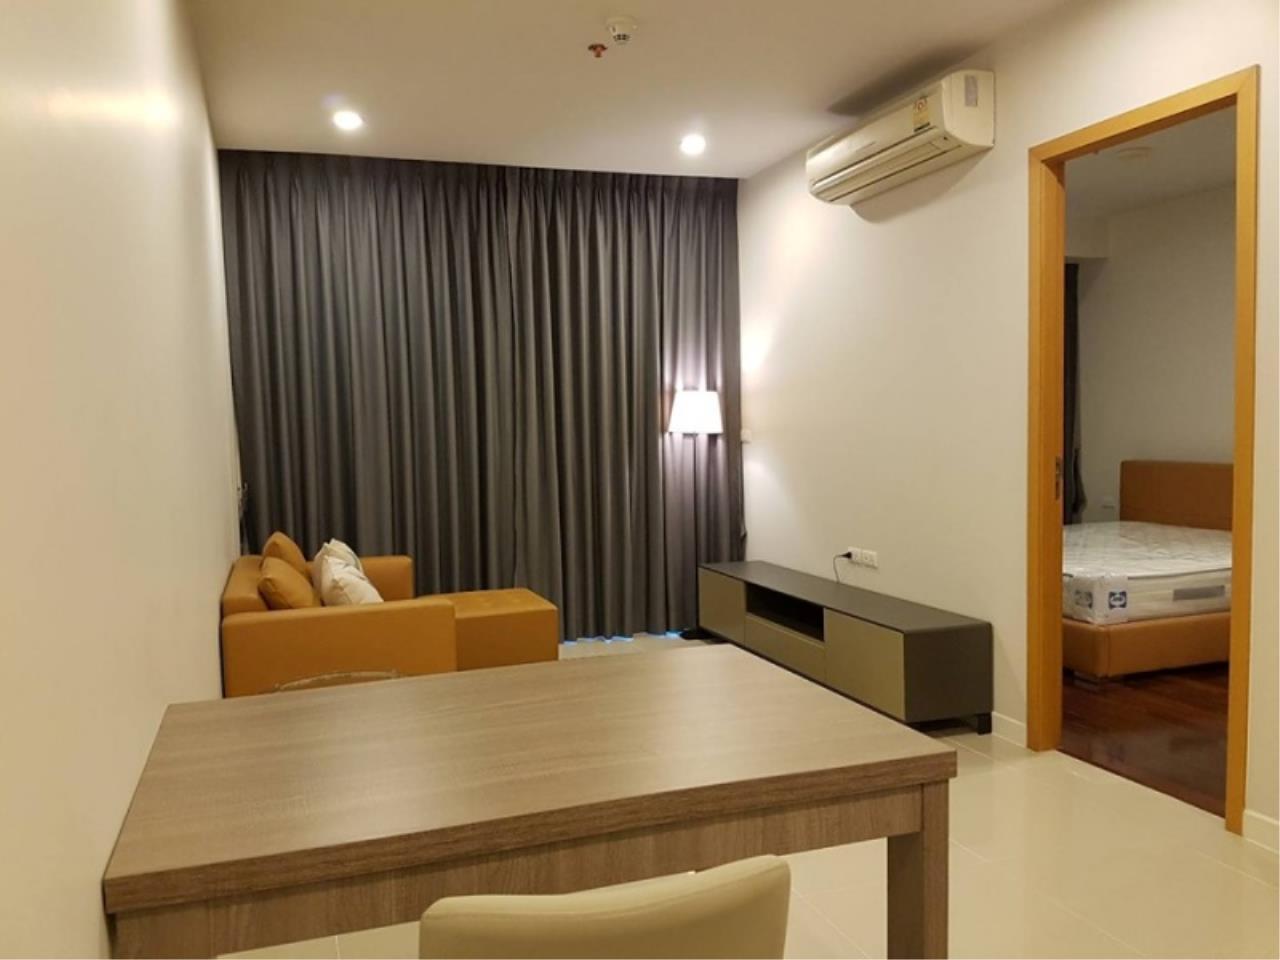 Century21 Skylux Agency's Circle Condominium / Condo For Rent / 1 Bedroom / 45 SQM / BTS Nana / Bangkok 2